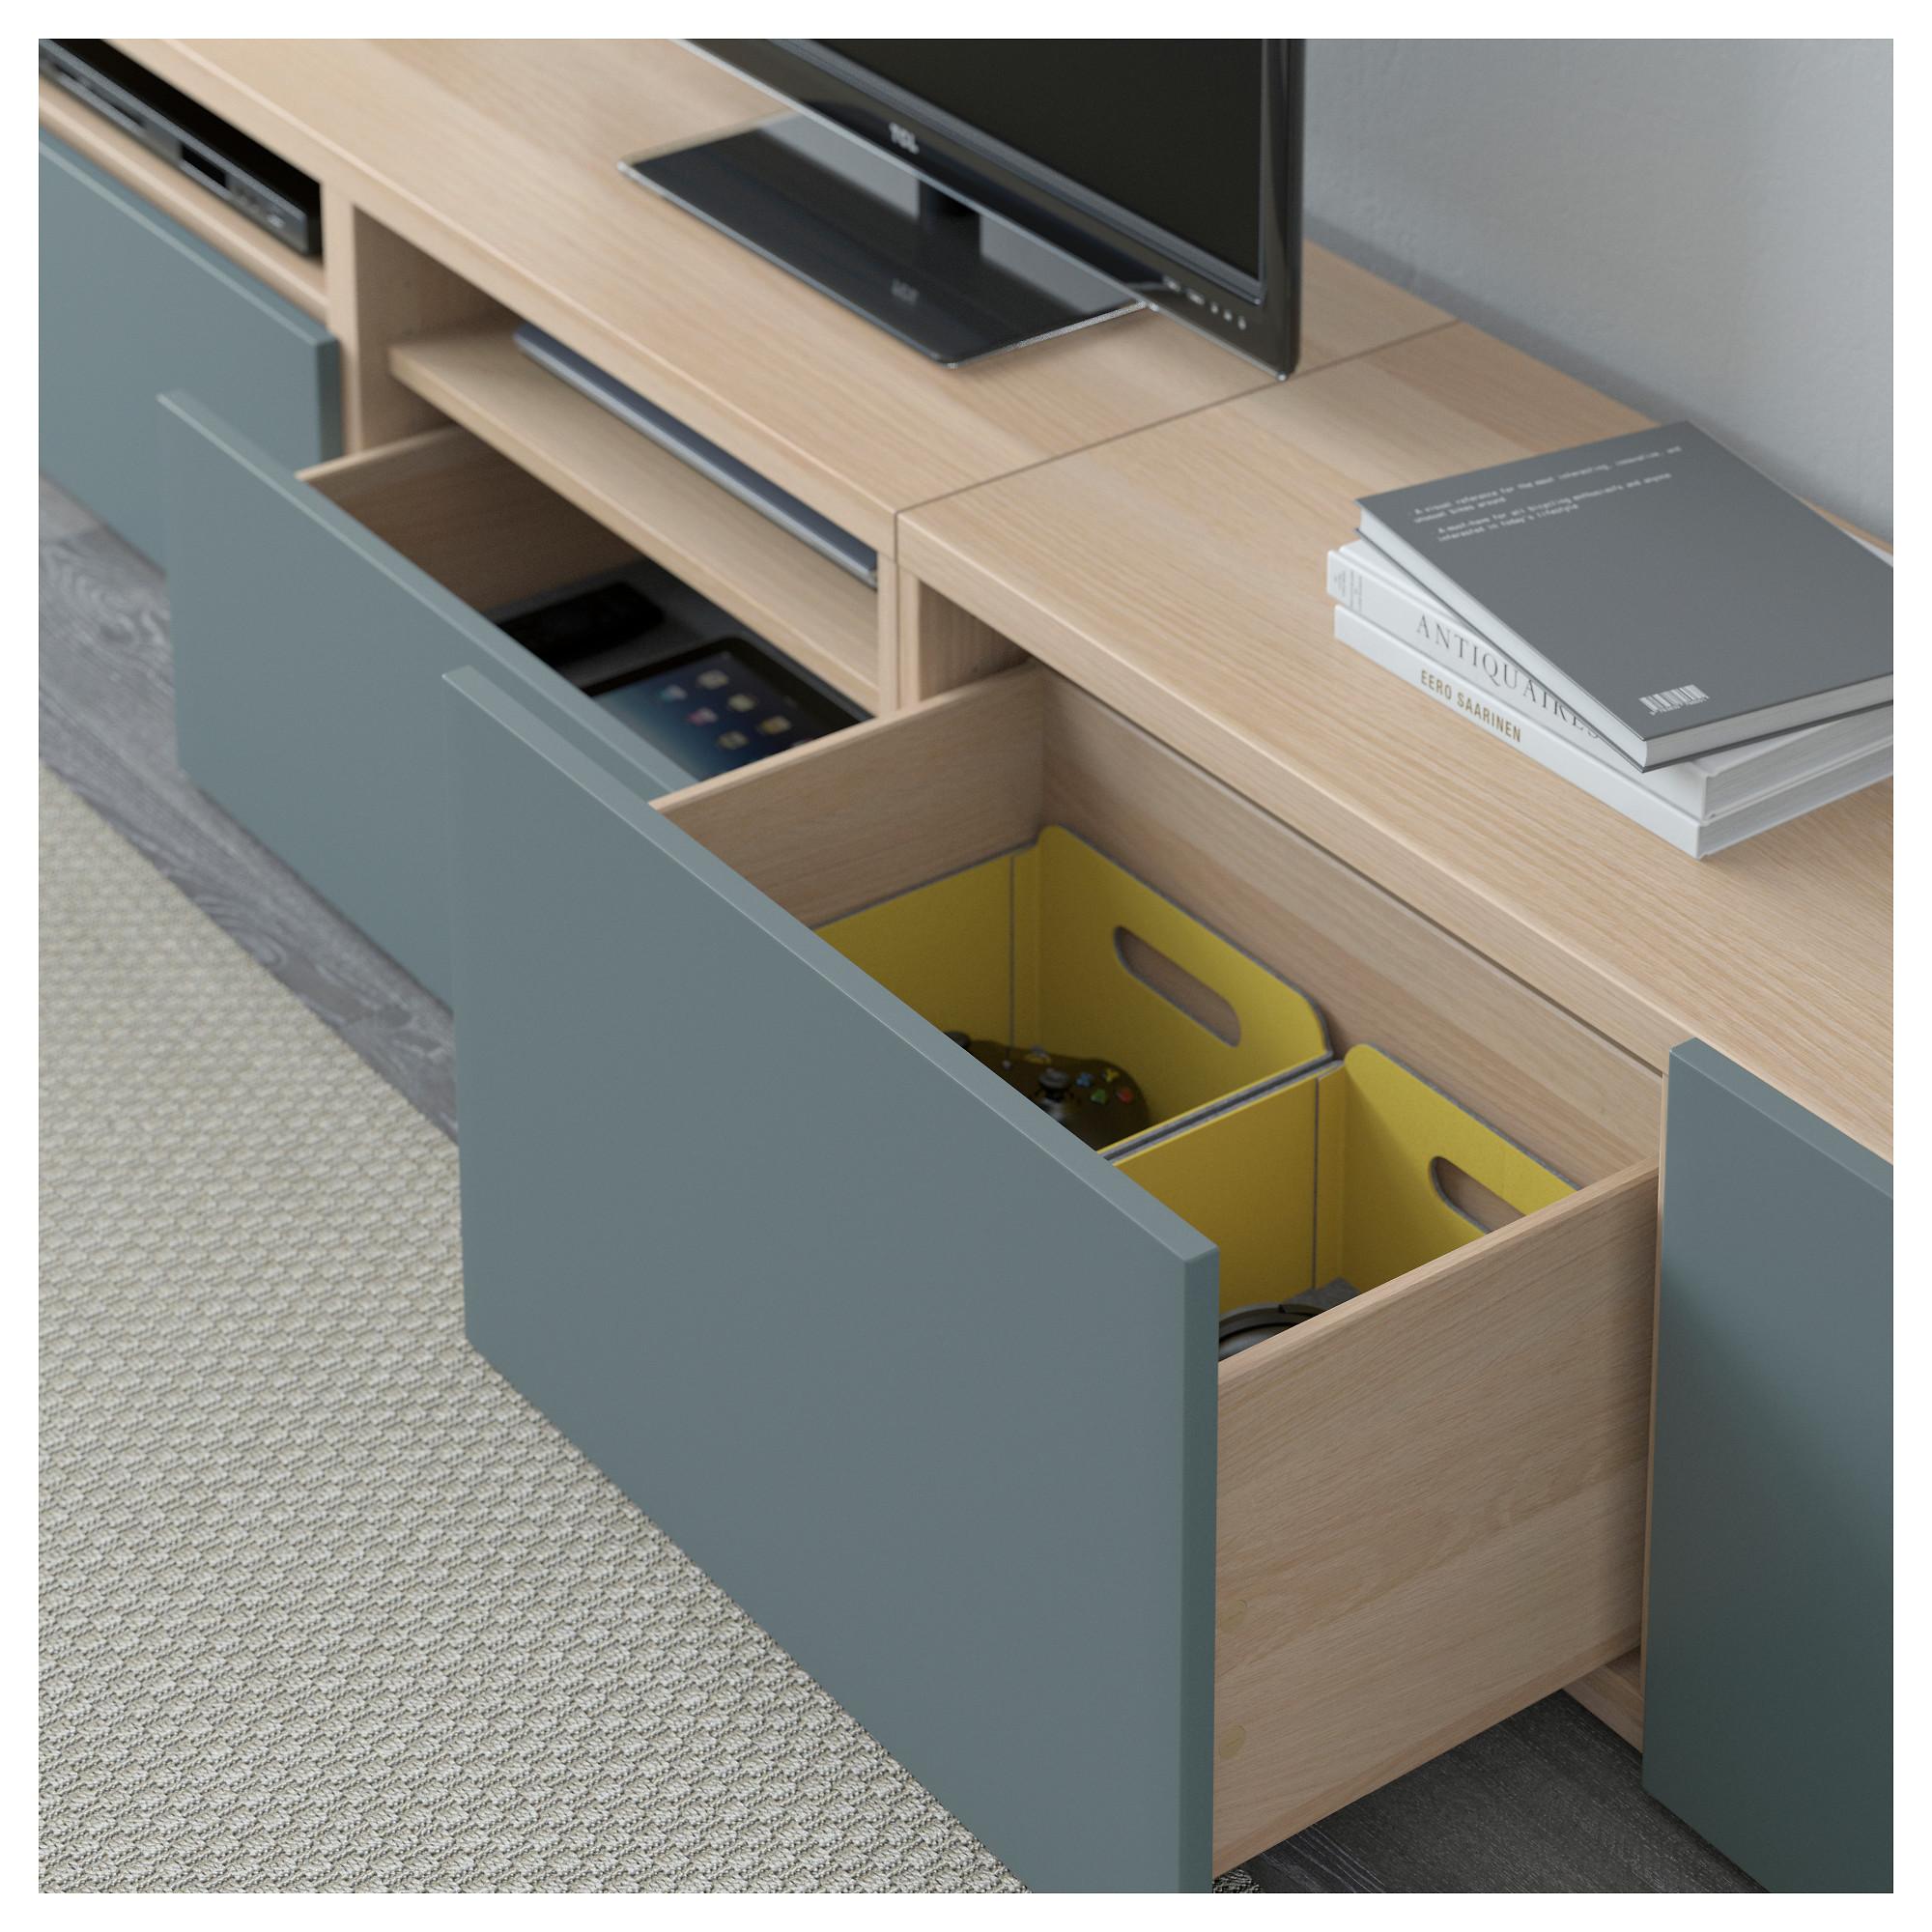 Шкаф для ТВ, комбинация БЕСТО артикуль № 792.516.70 в наличии. Онлайн магазин IKEA Минск. Недорогая доставка и установка.